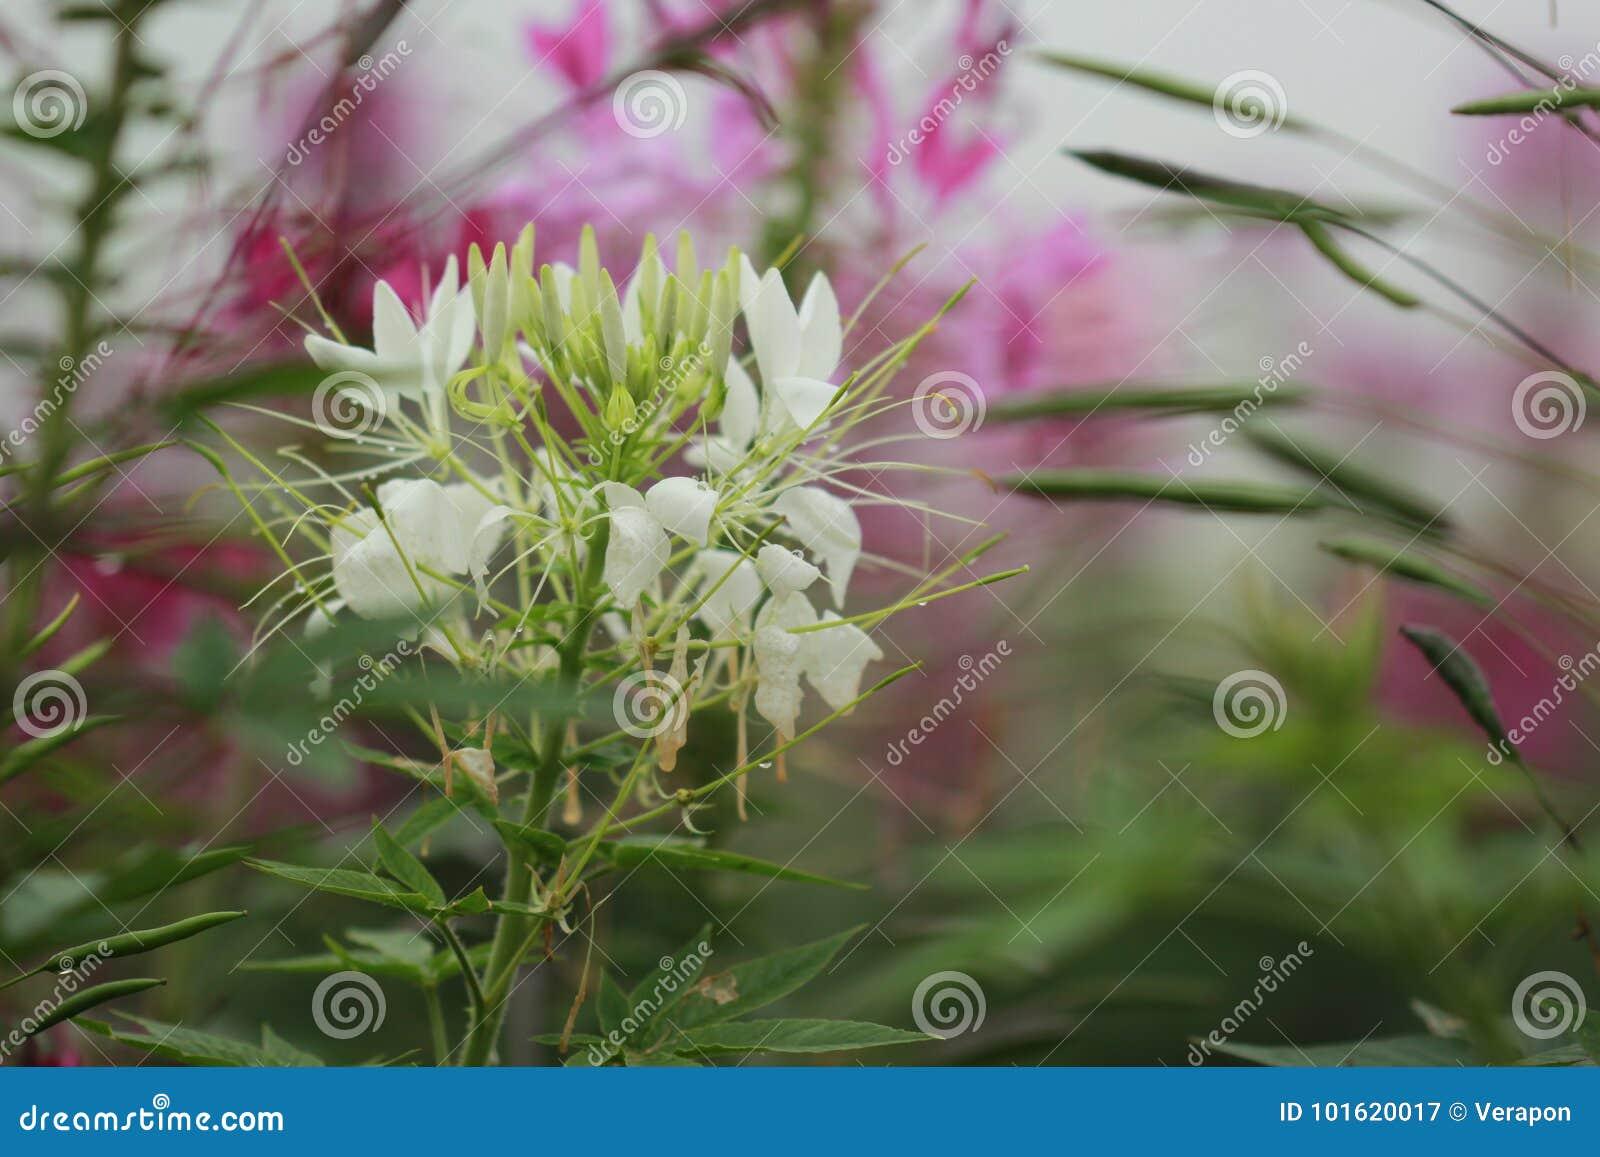 White Spider Flower Stock Image Image Of Spring Cleome 101620017